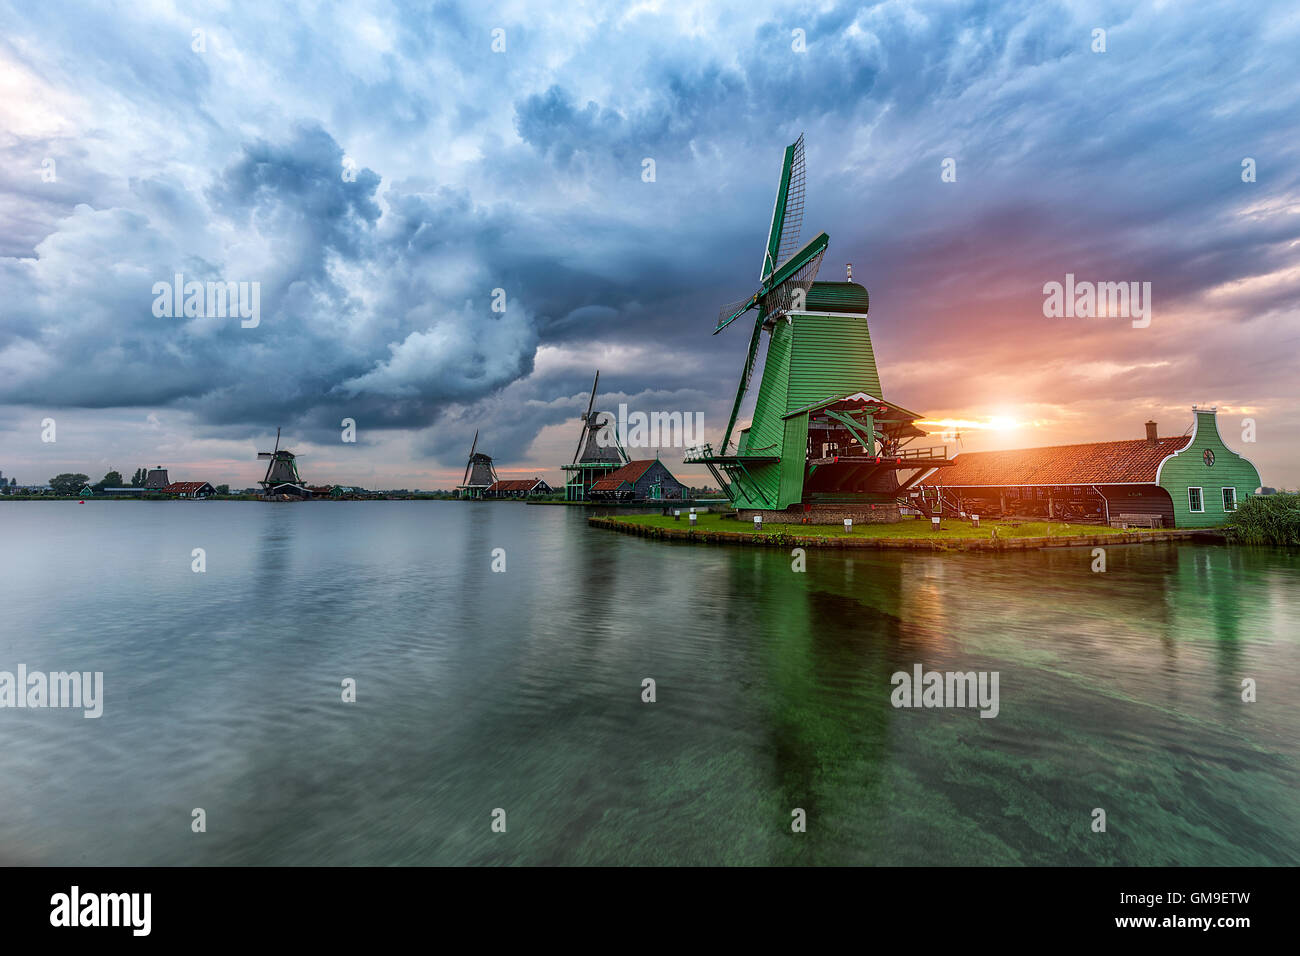 Stormy beauty - Stock Image